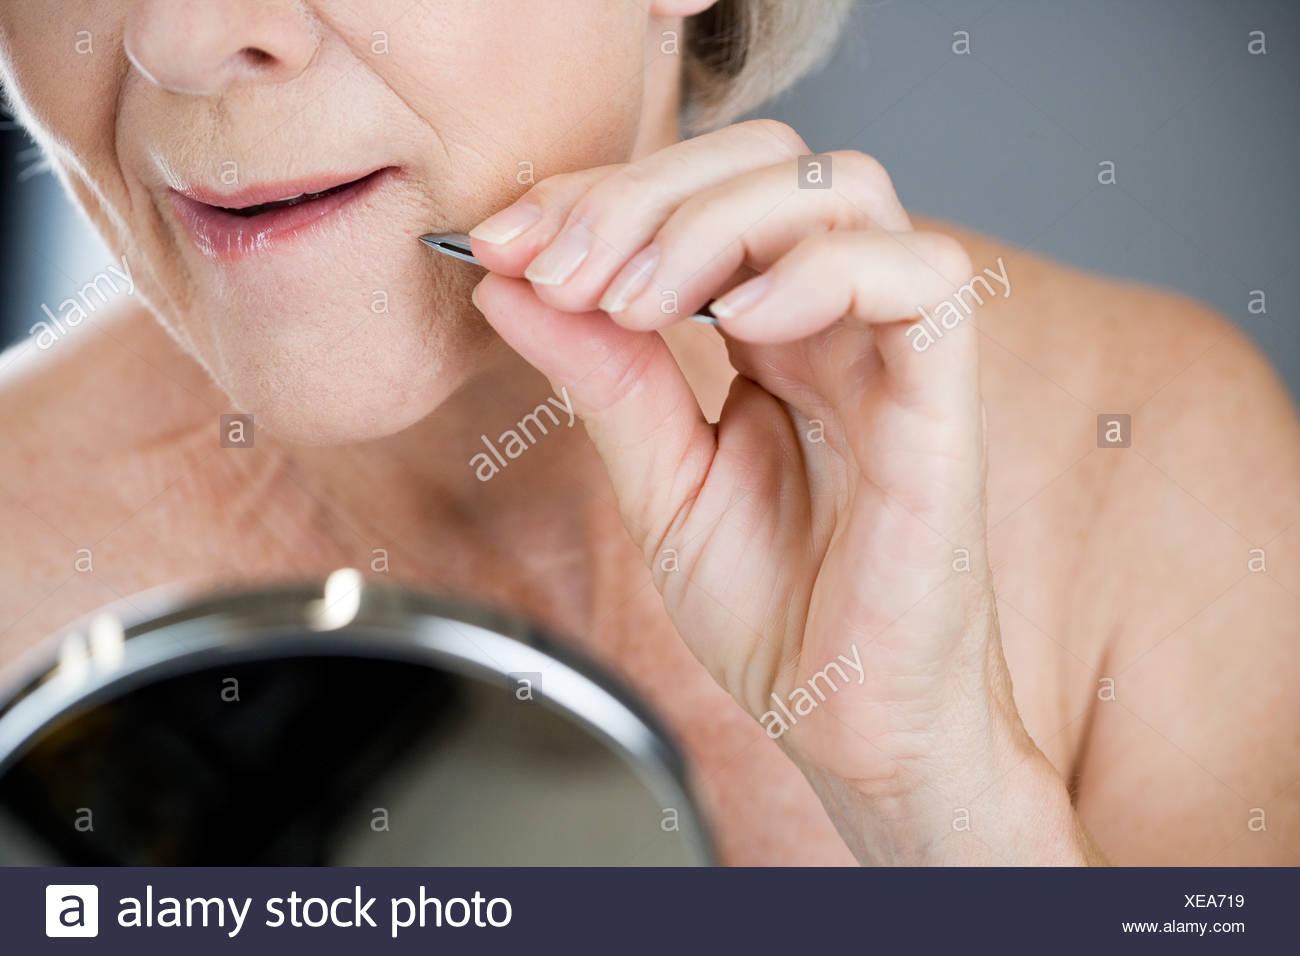 peli mento donne pinzetta